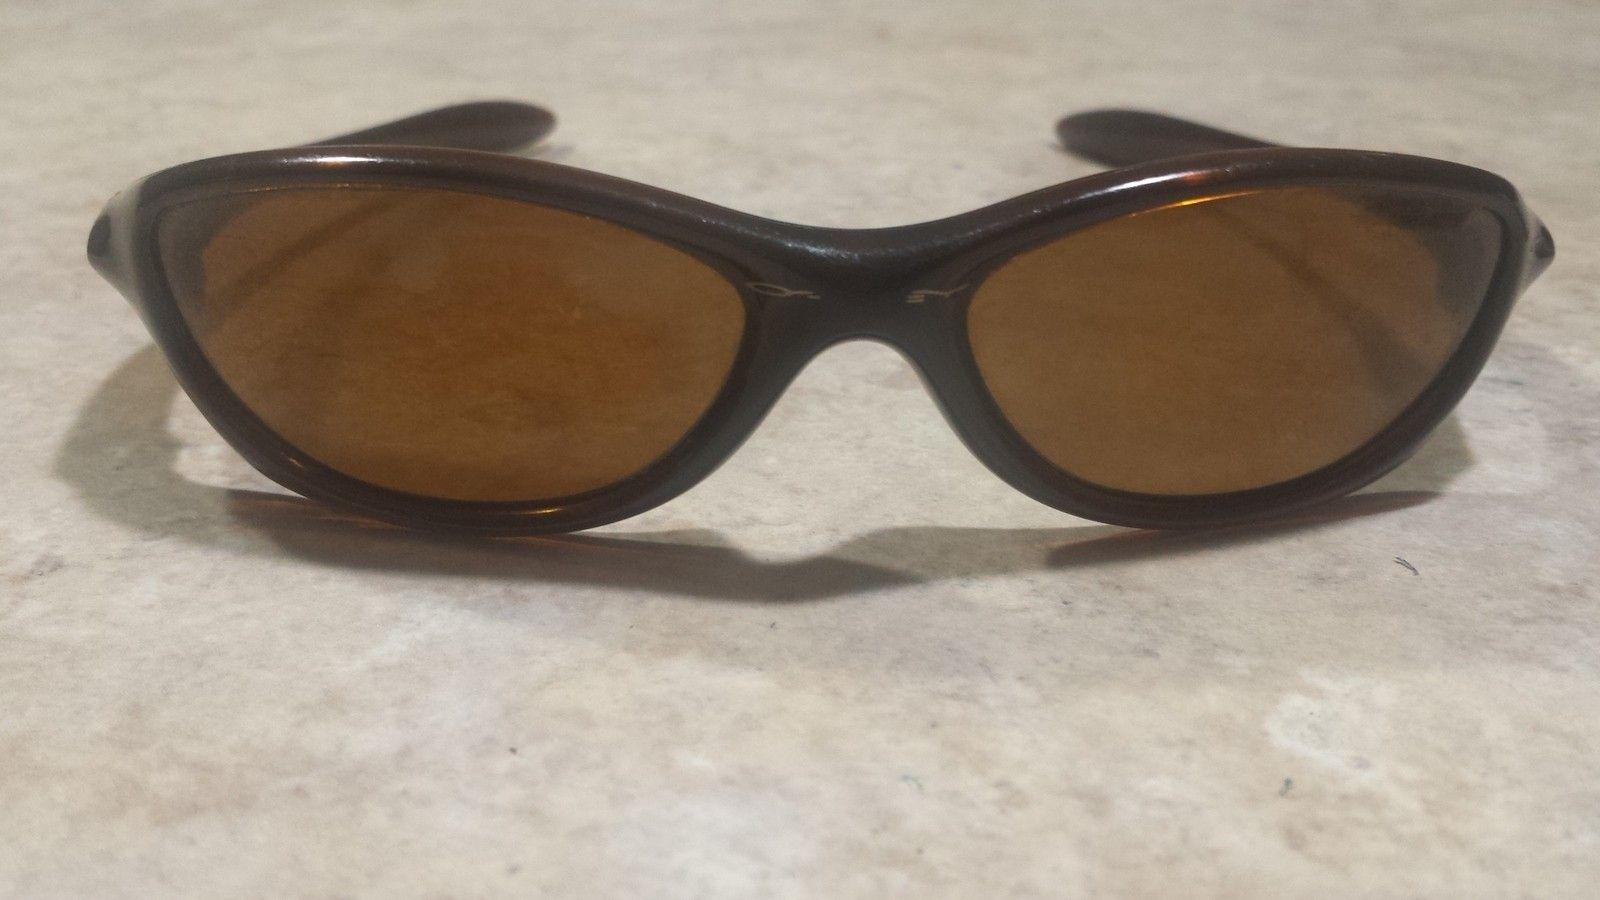 Name these Oakley sunglasses! - 1441596896254.jpg